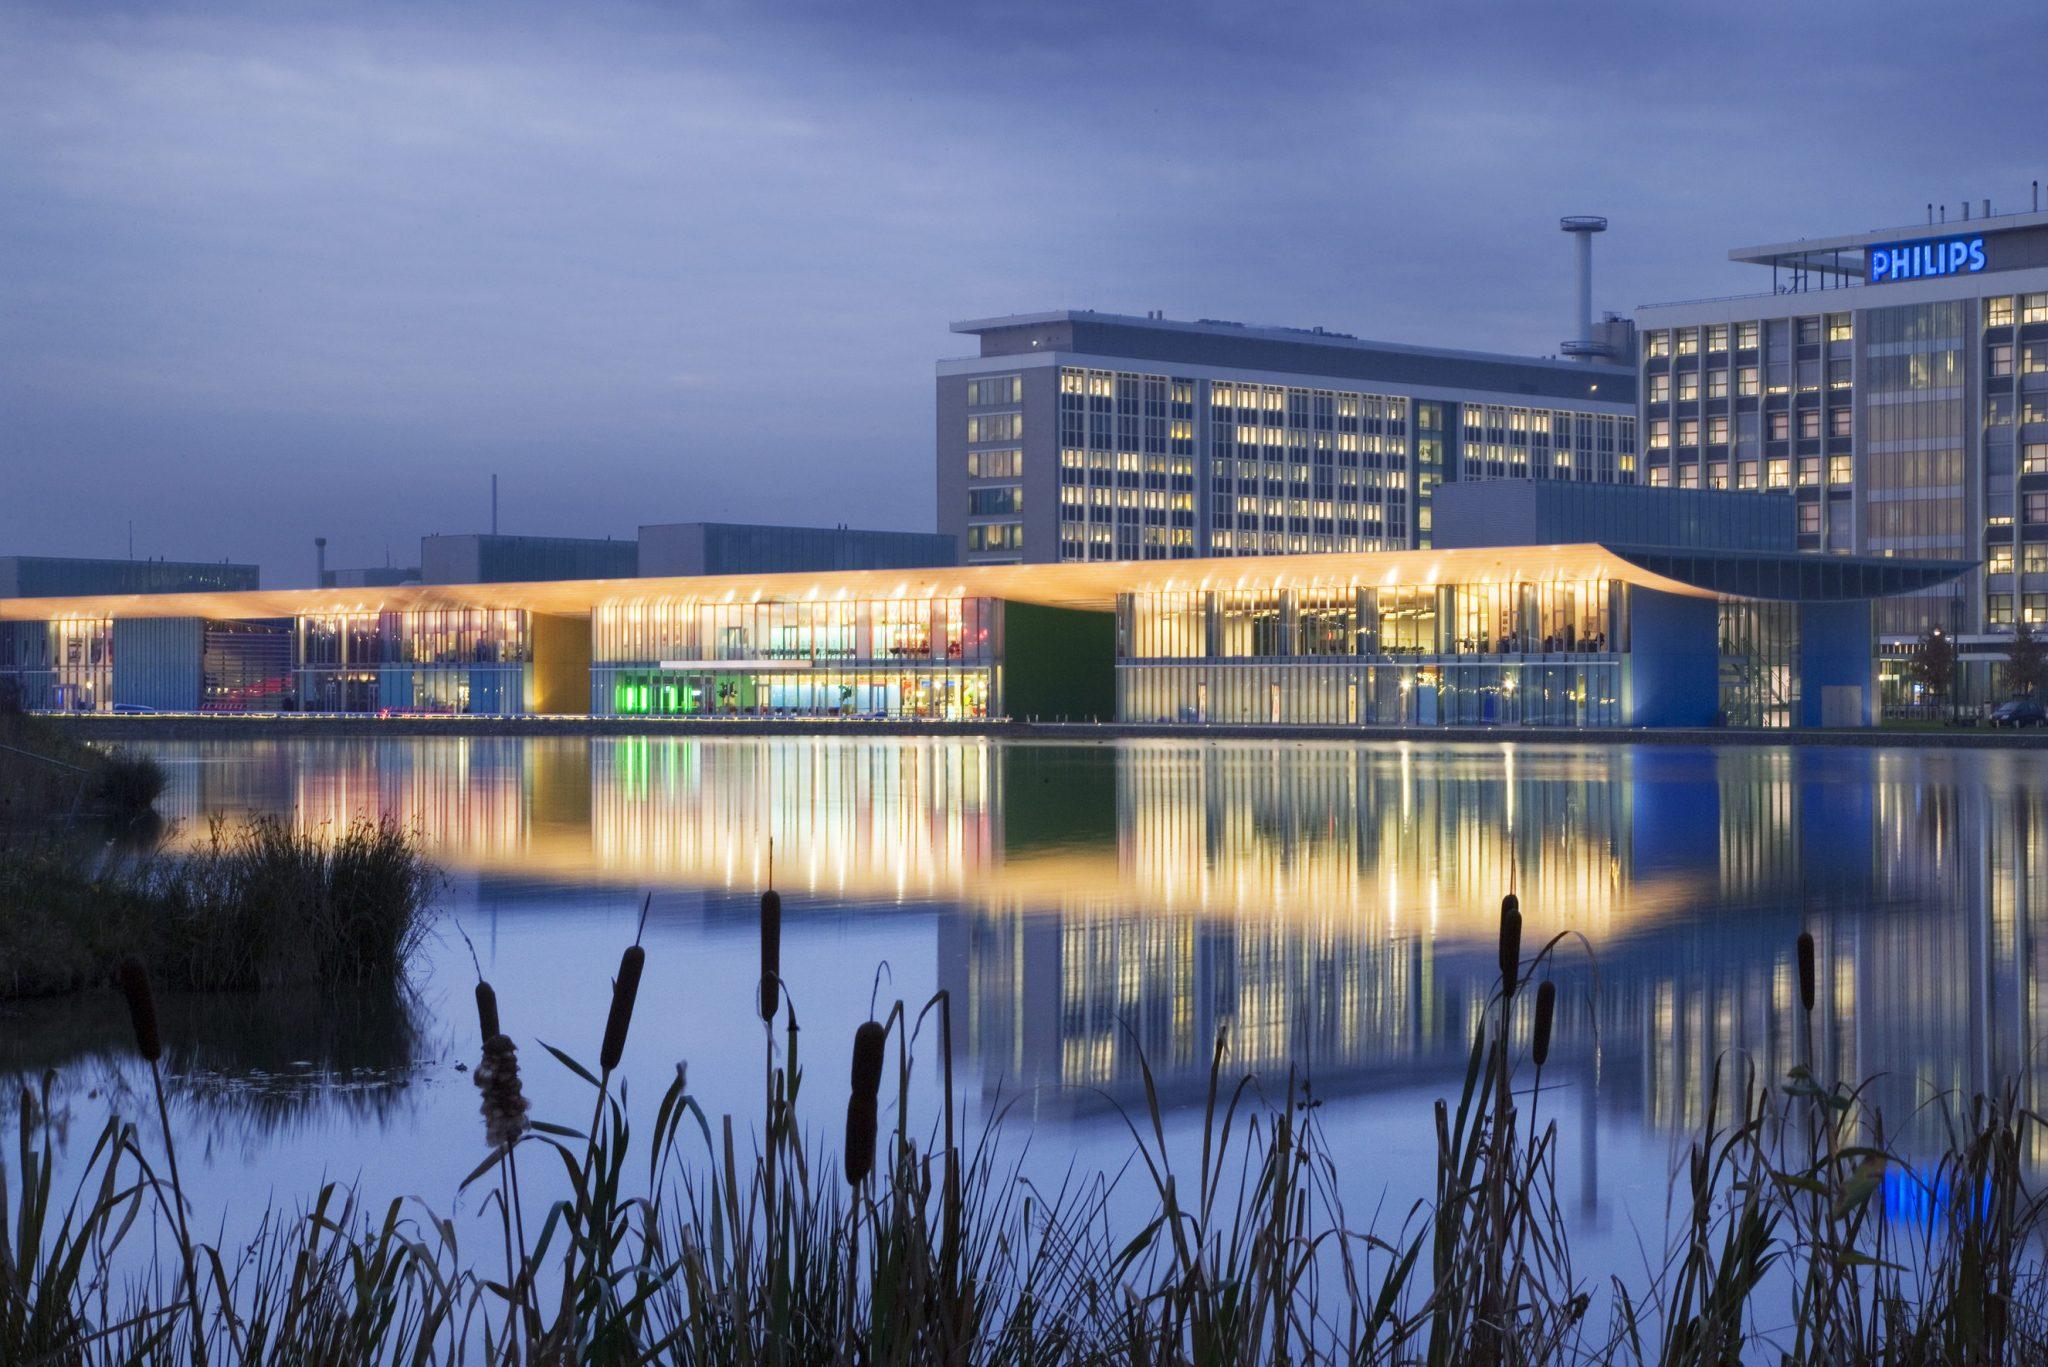 High Tech Campus, The Netherlands. Credit: High Tech Campus / Bron-Norbert-van-Onna